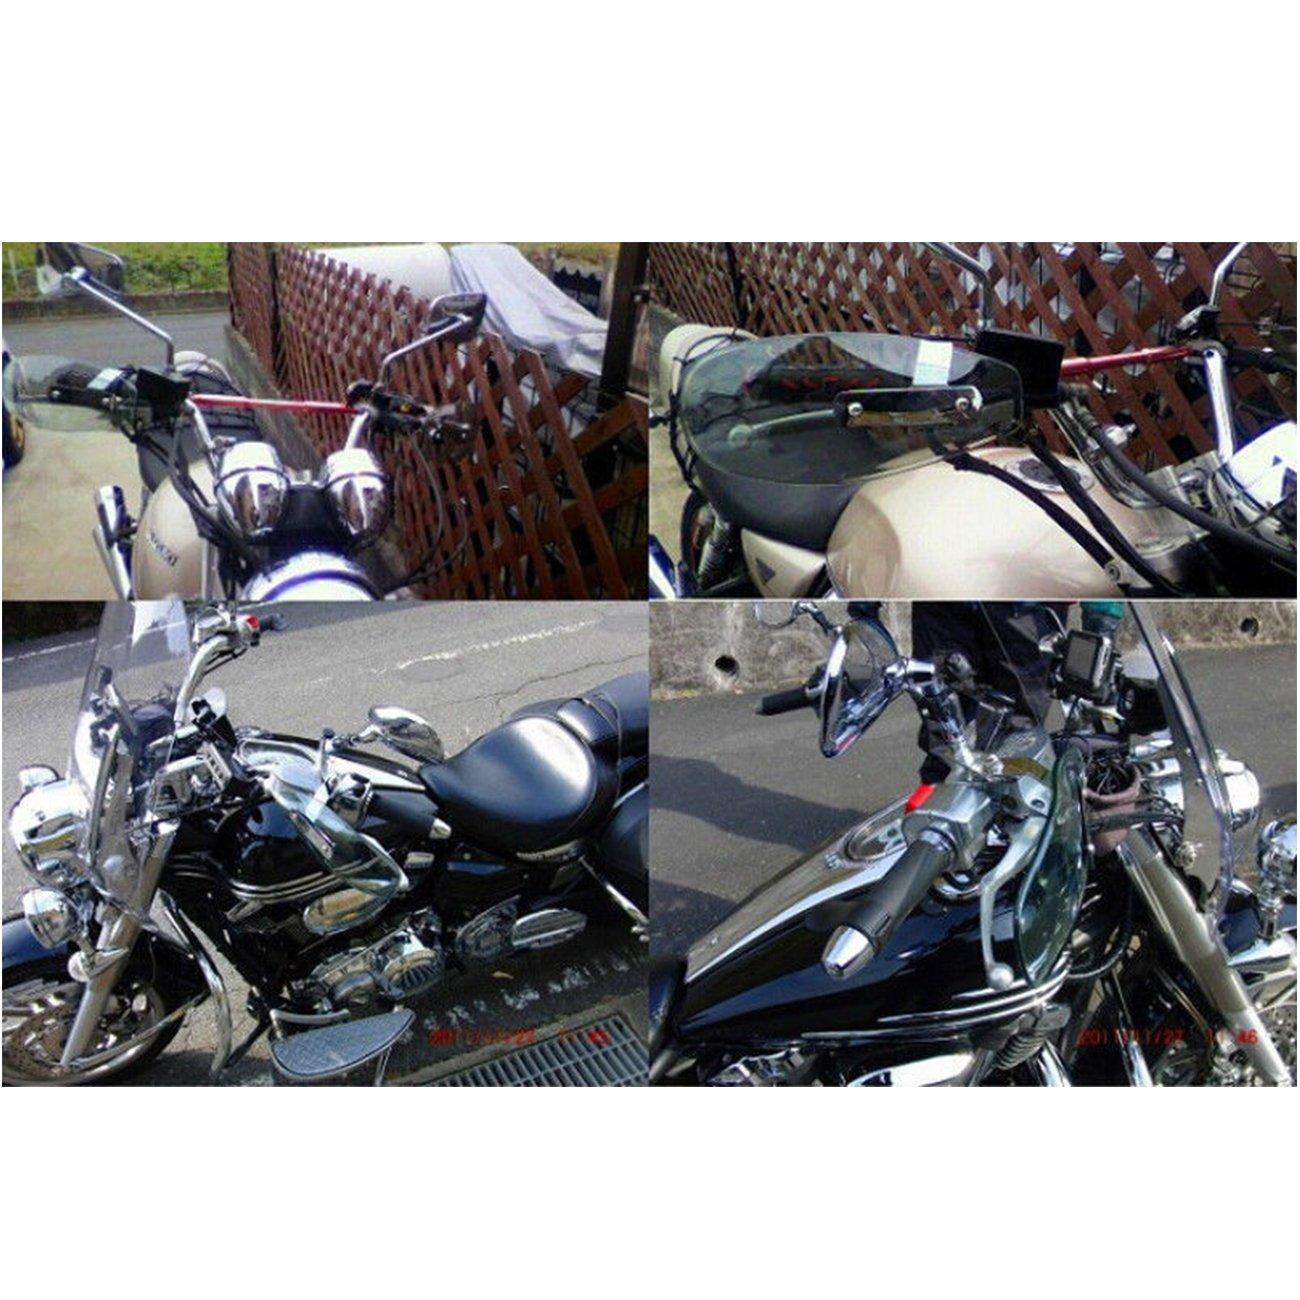 Leslaur Deflettori Antivento per paramani per paramani per Harley Honda Suzuki Cruiser